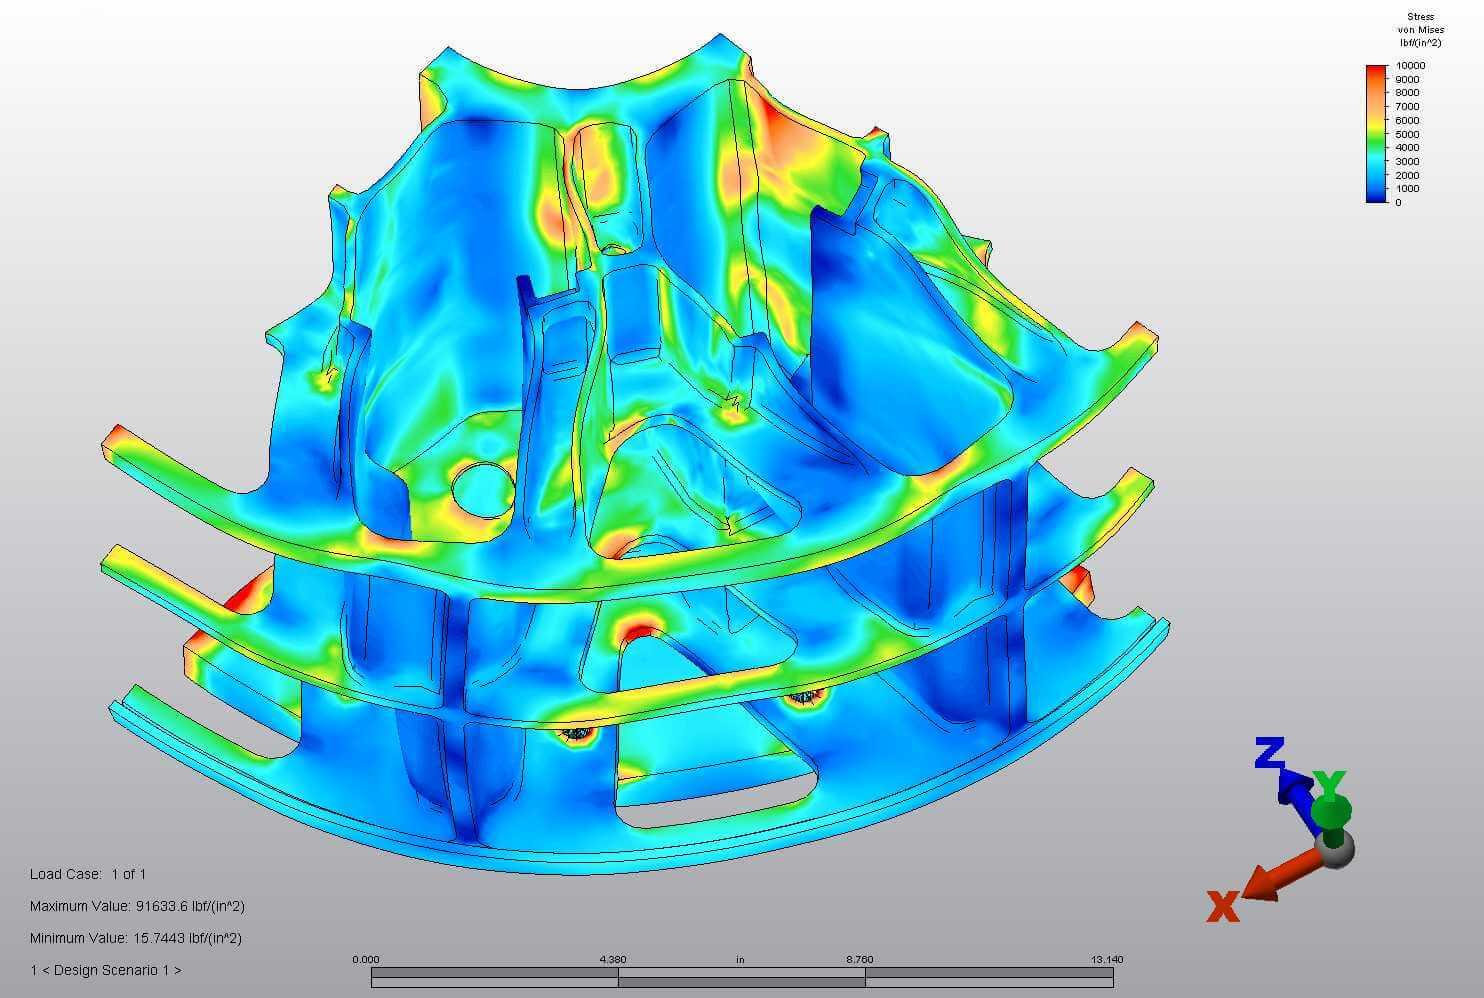 Centrifuge Rotor CAD Model